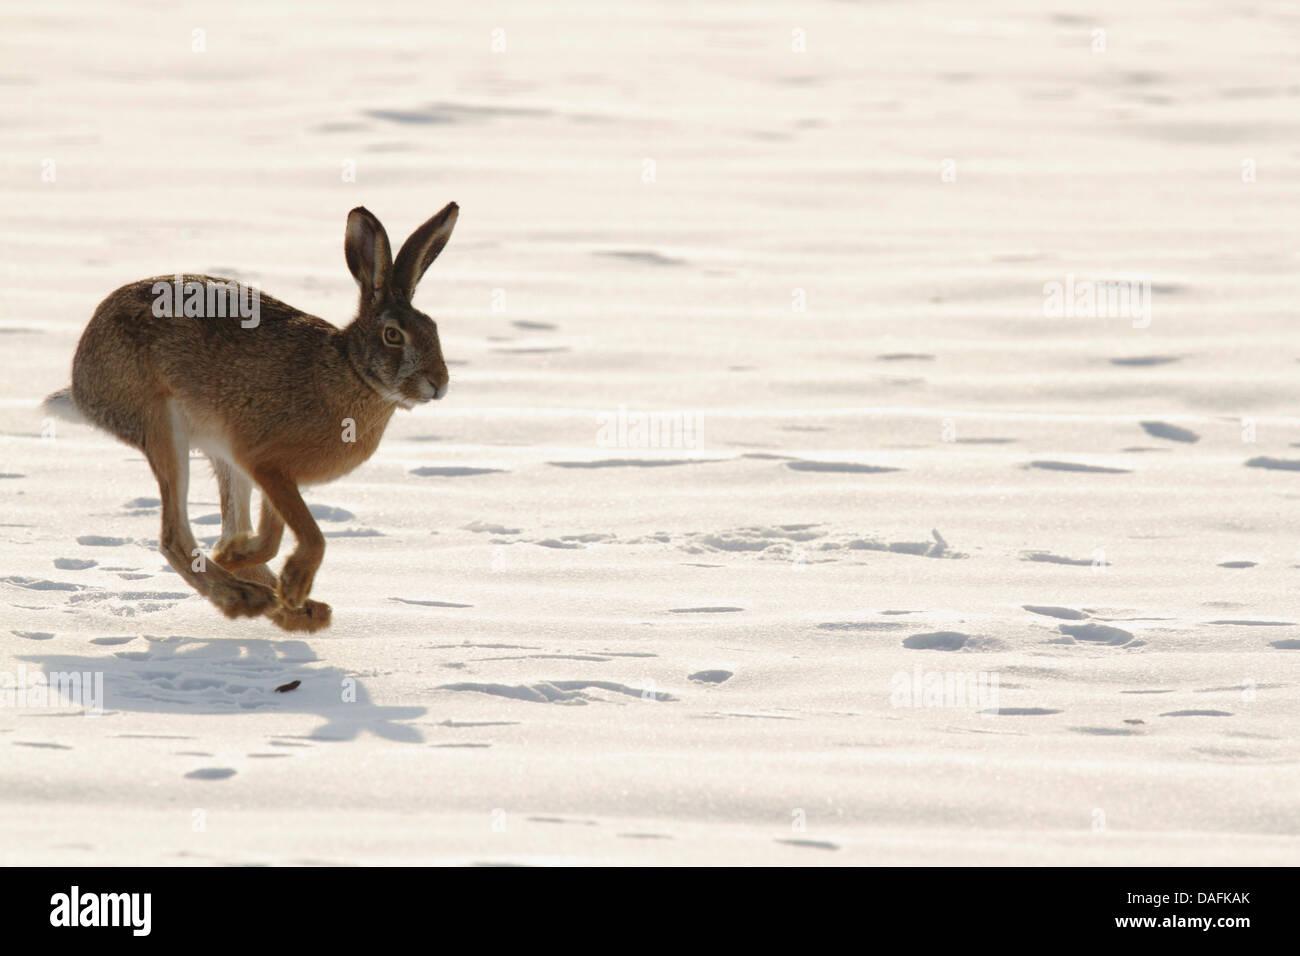 European hare, Brown hare (Lepus europaeus), scampering in the snow, Austria, Burgenland - Stock Image